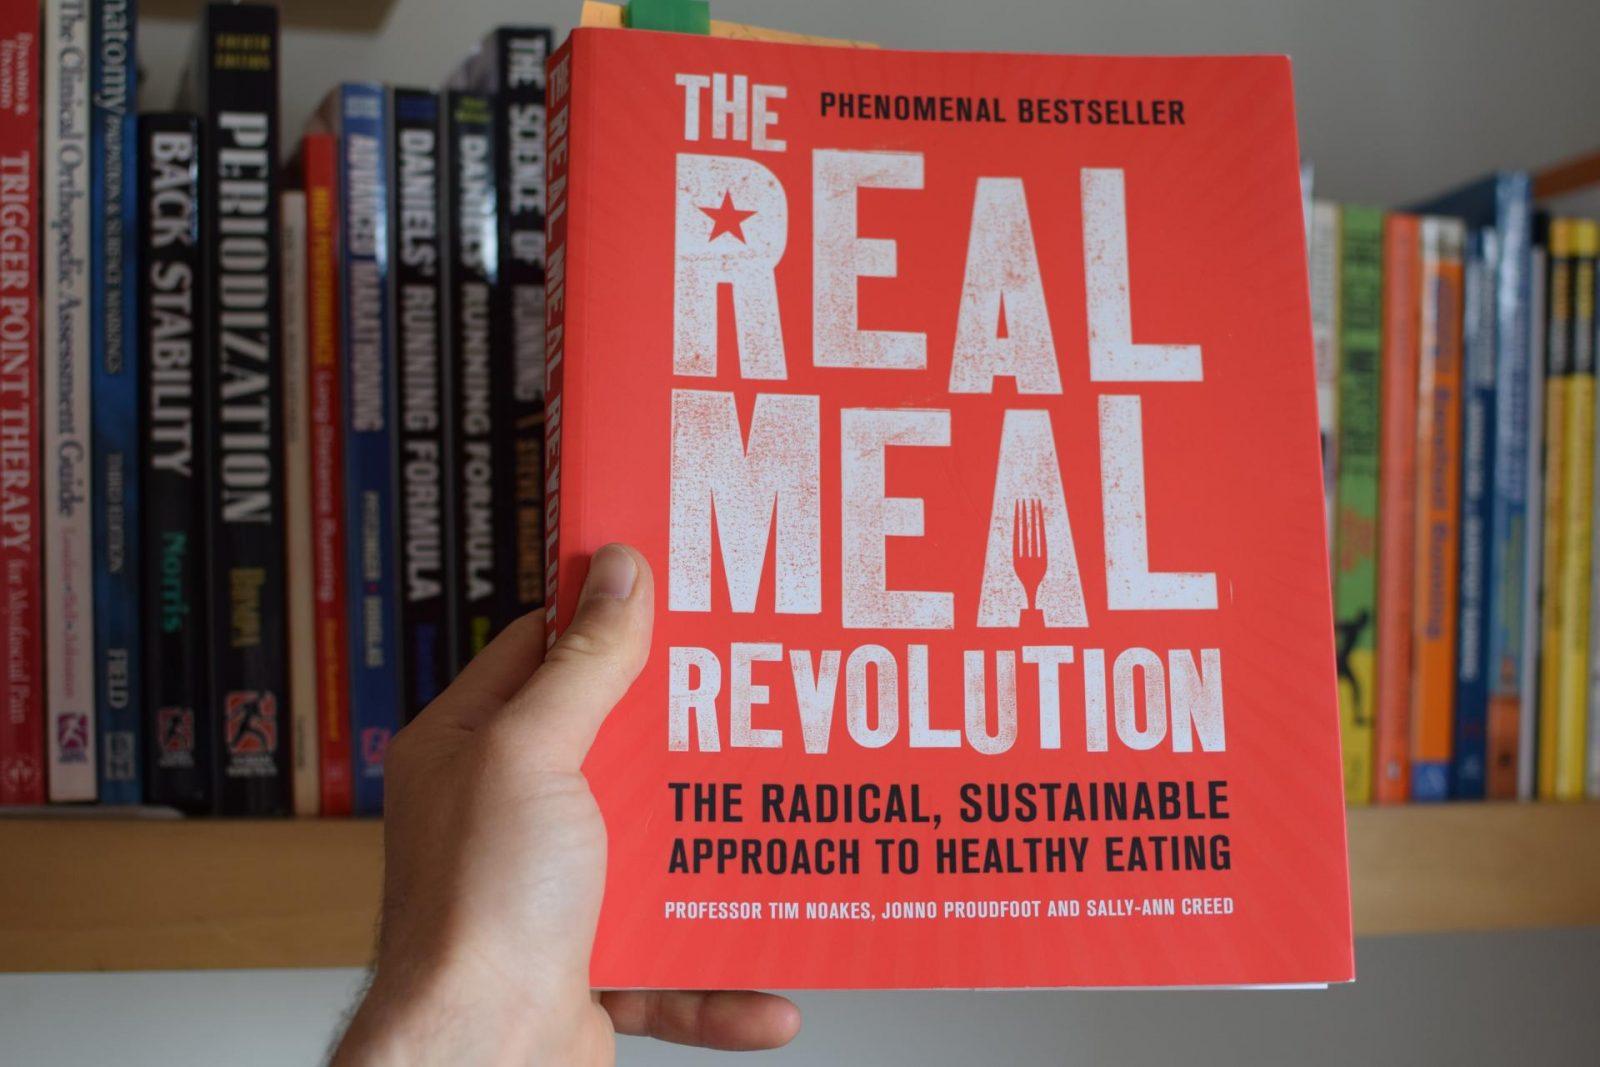 elevate real meal shelf